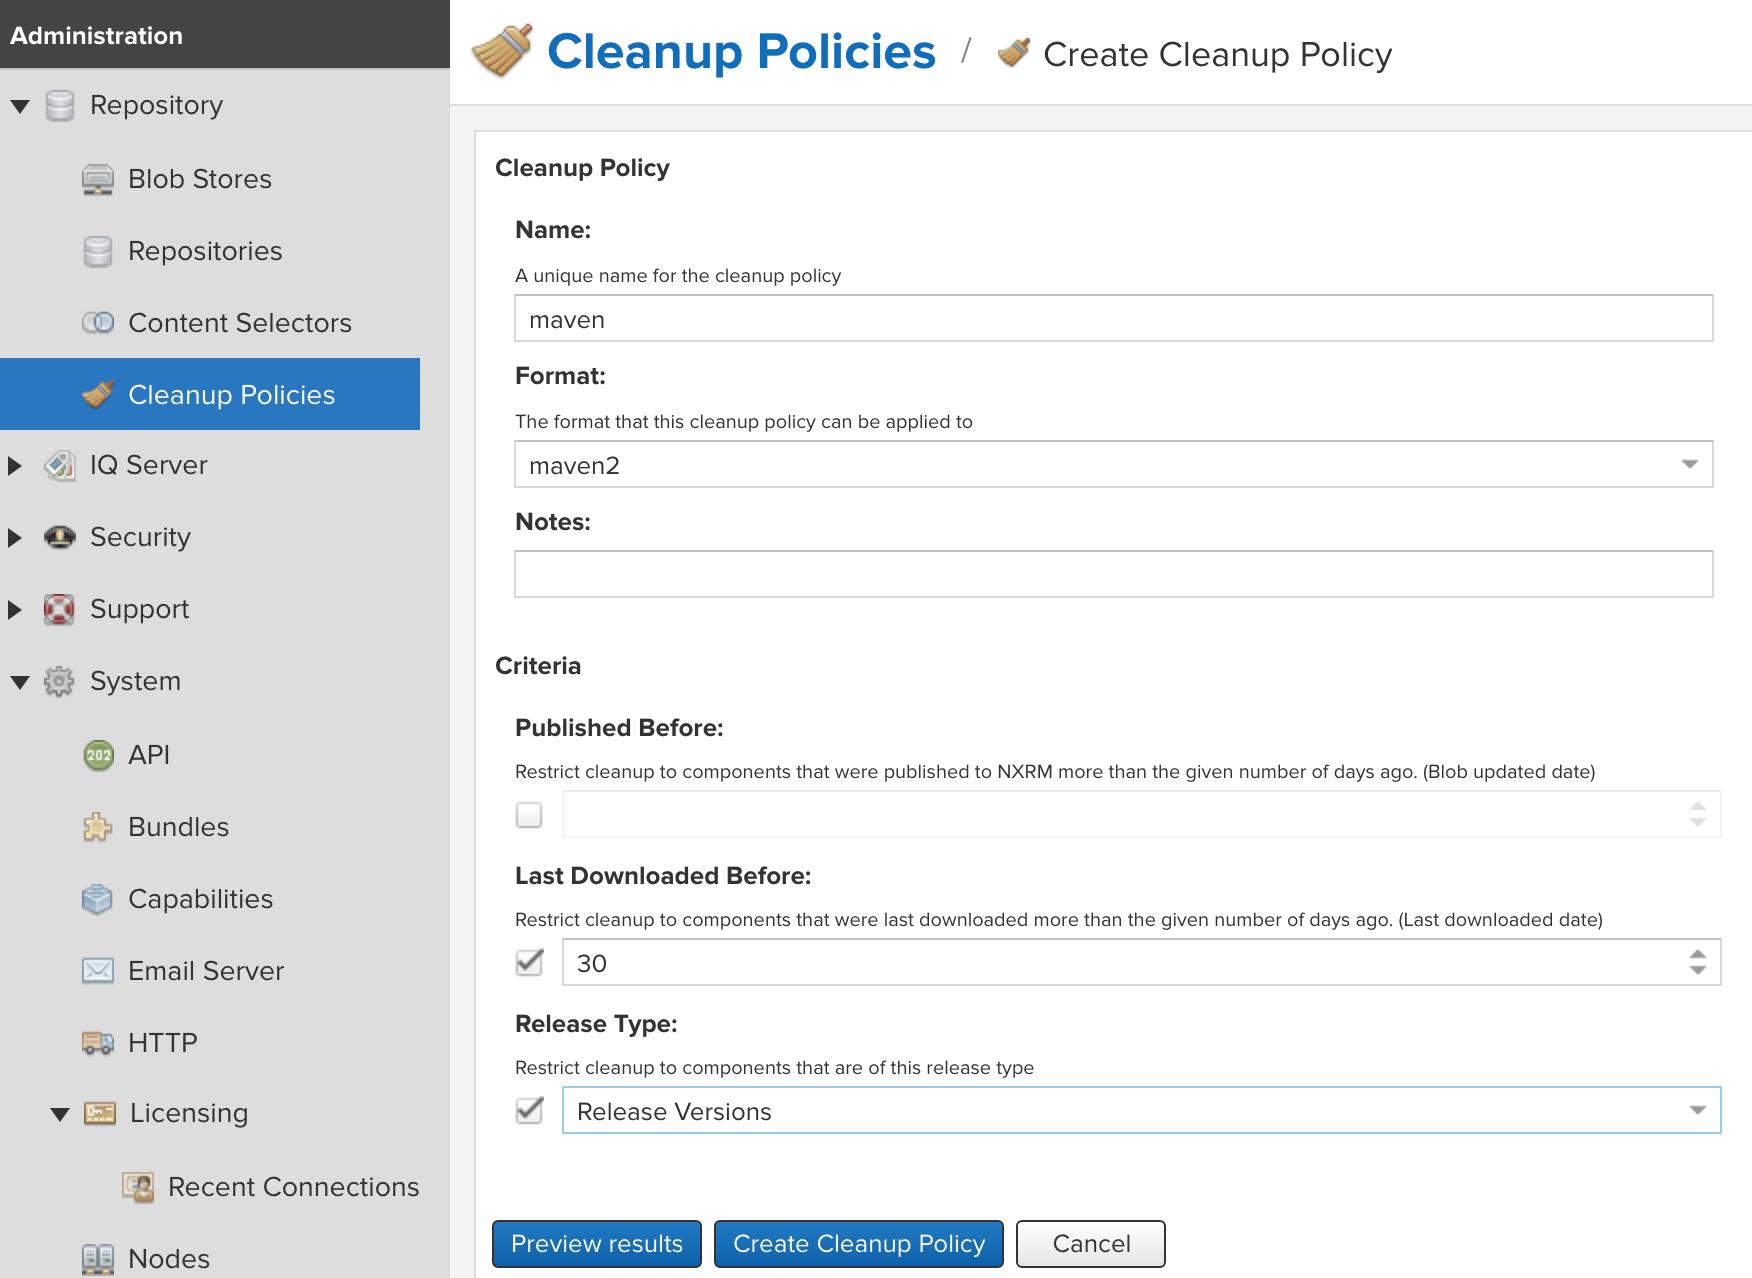 Cleanup Policies